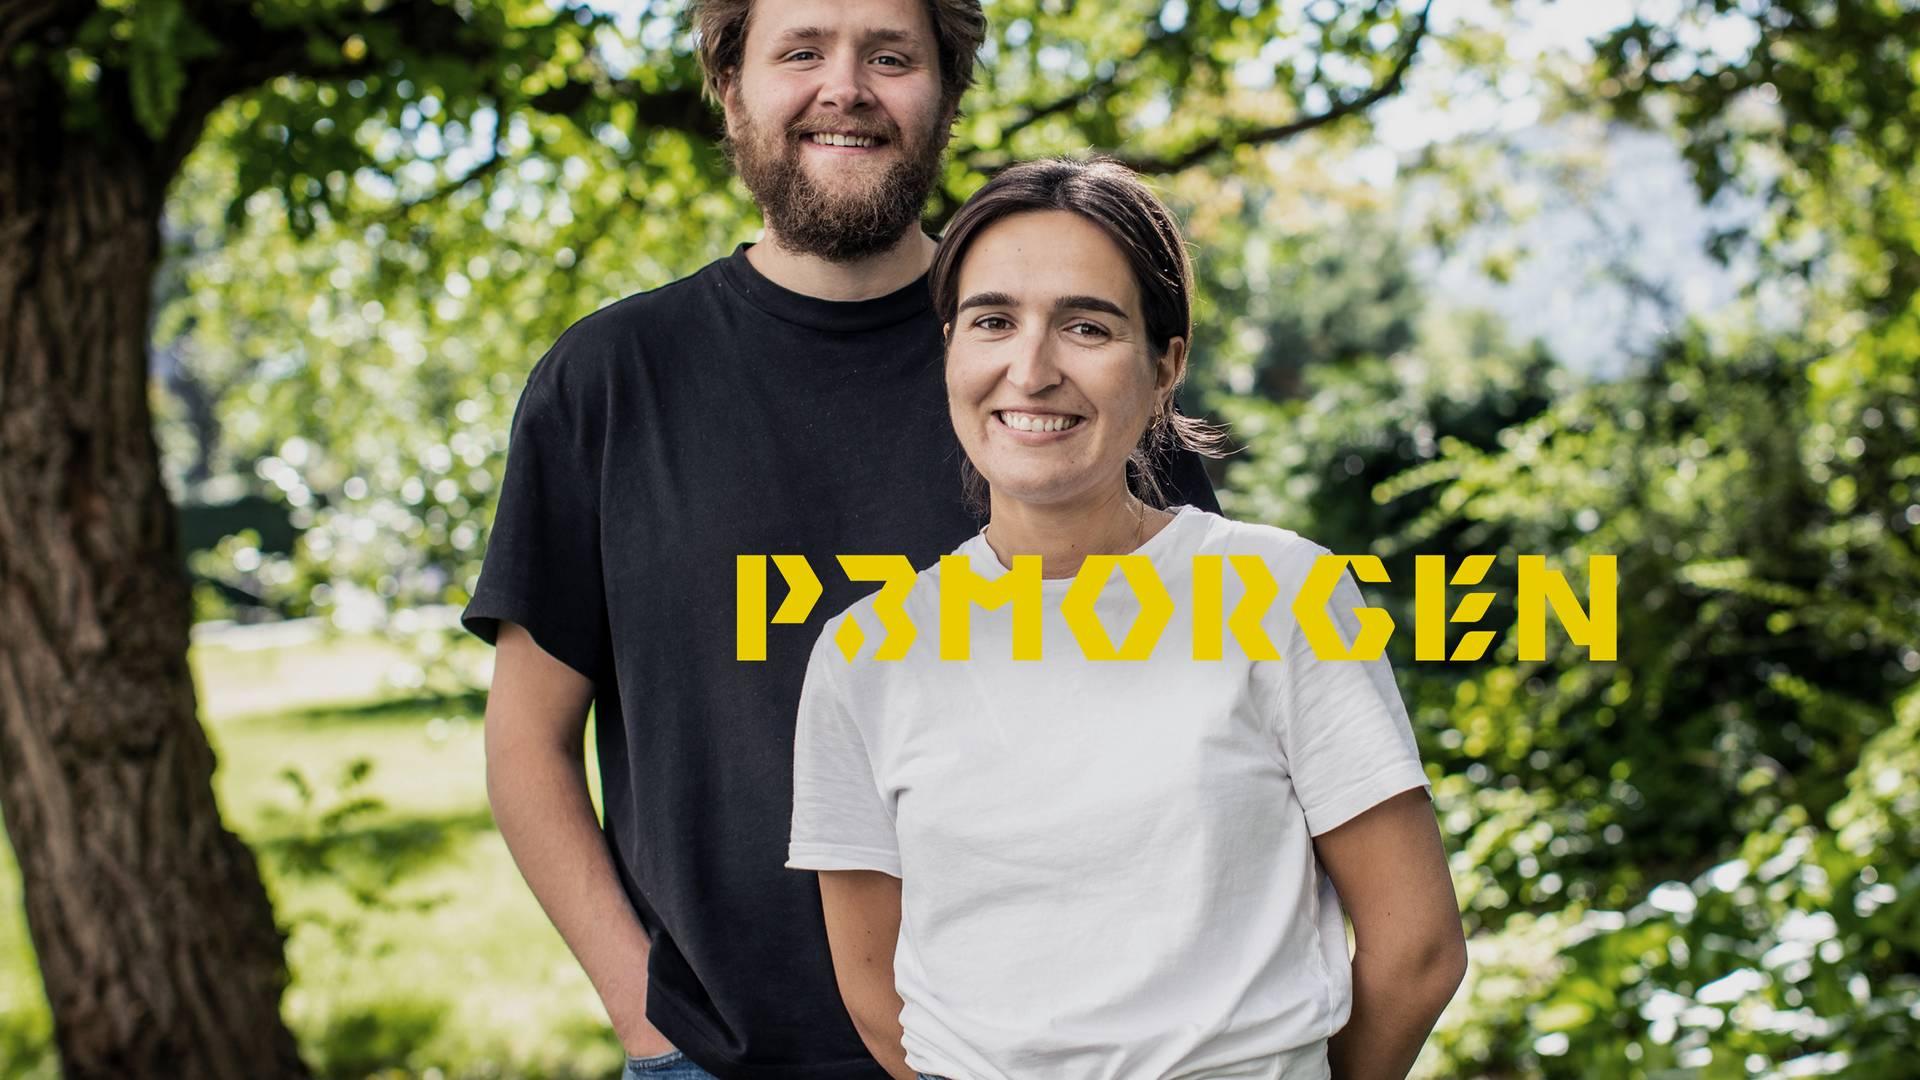 P3morgen Nrk Radio